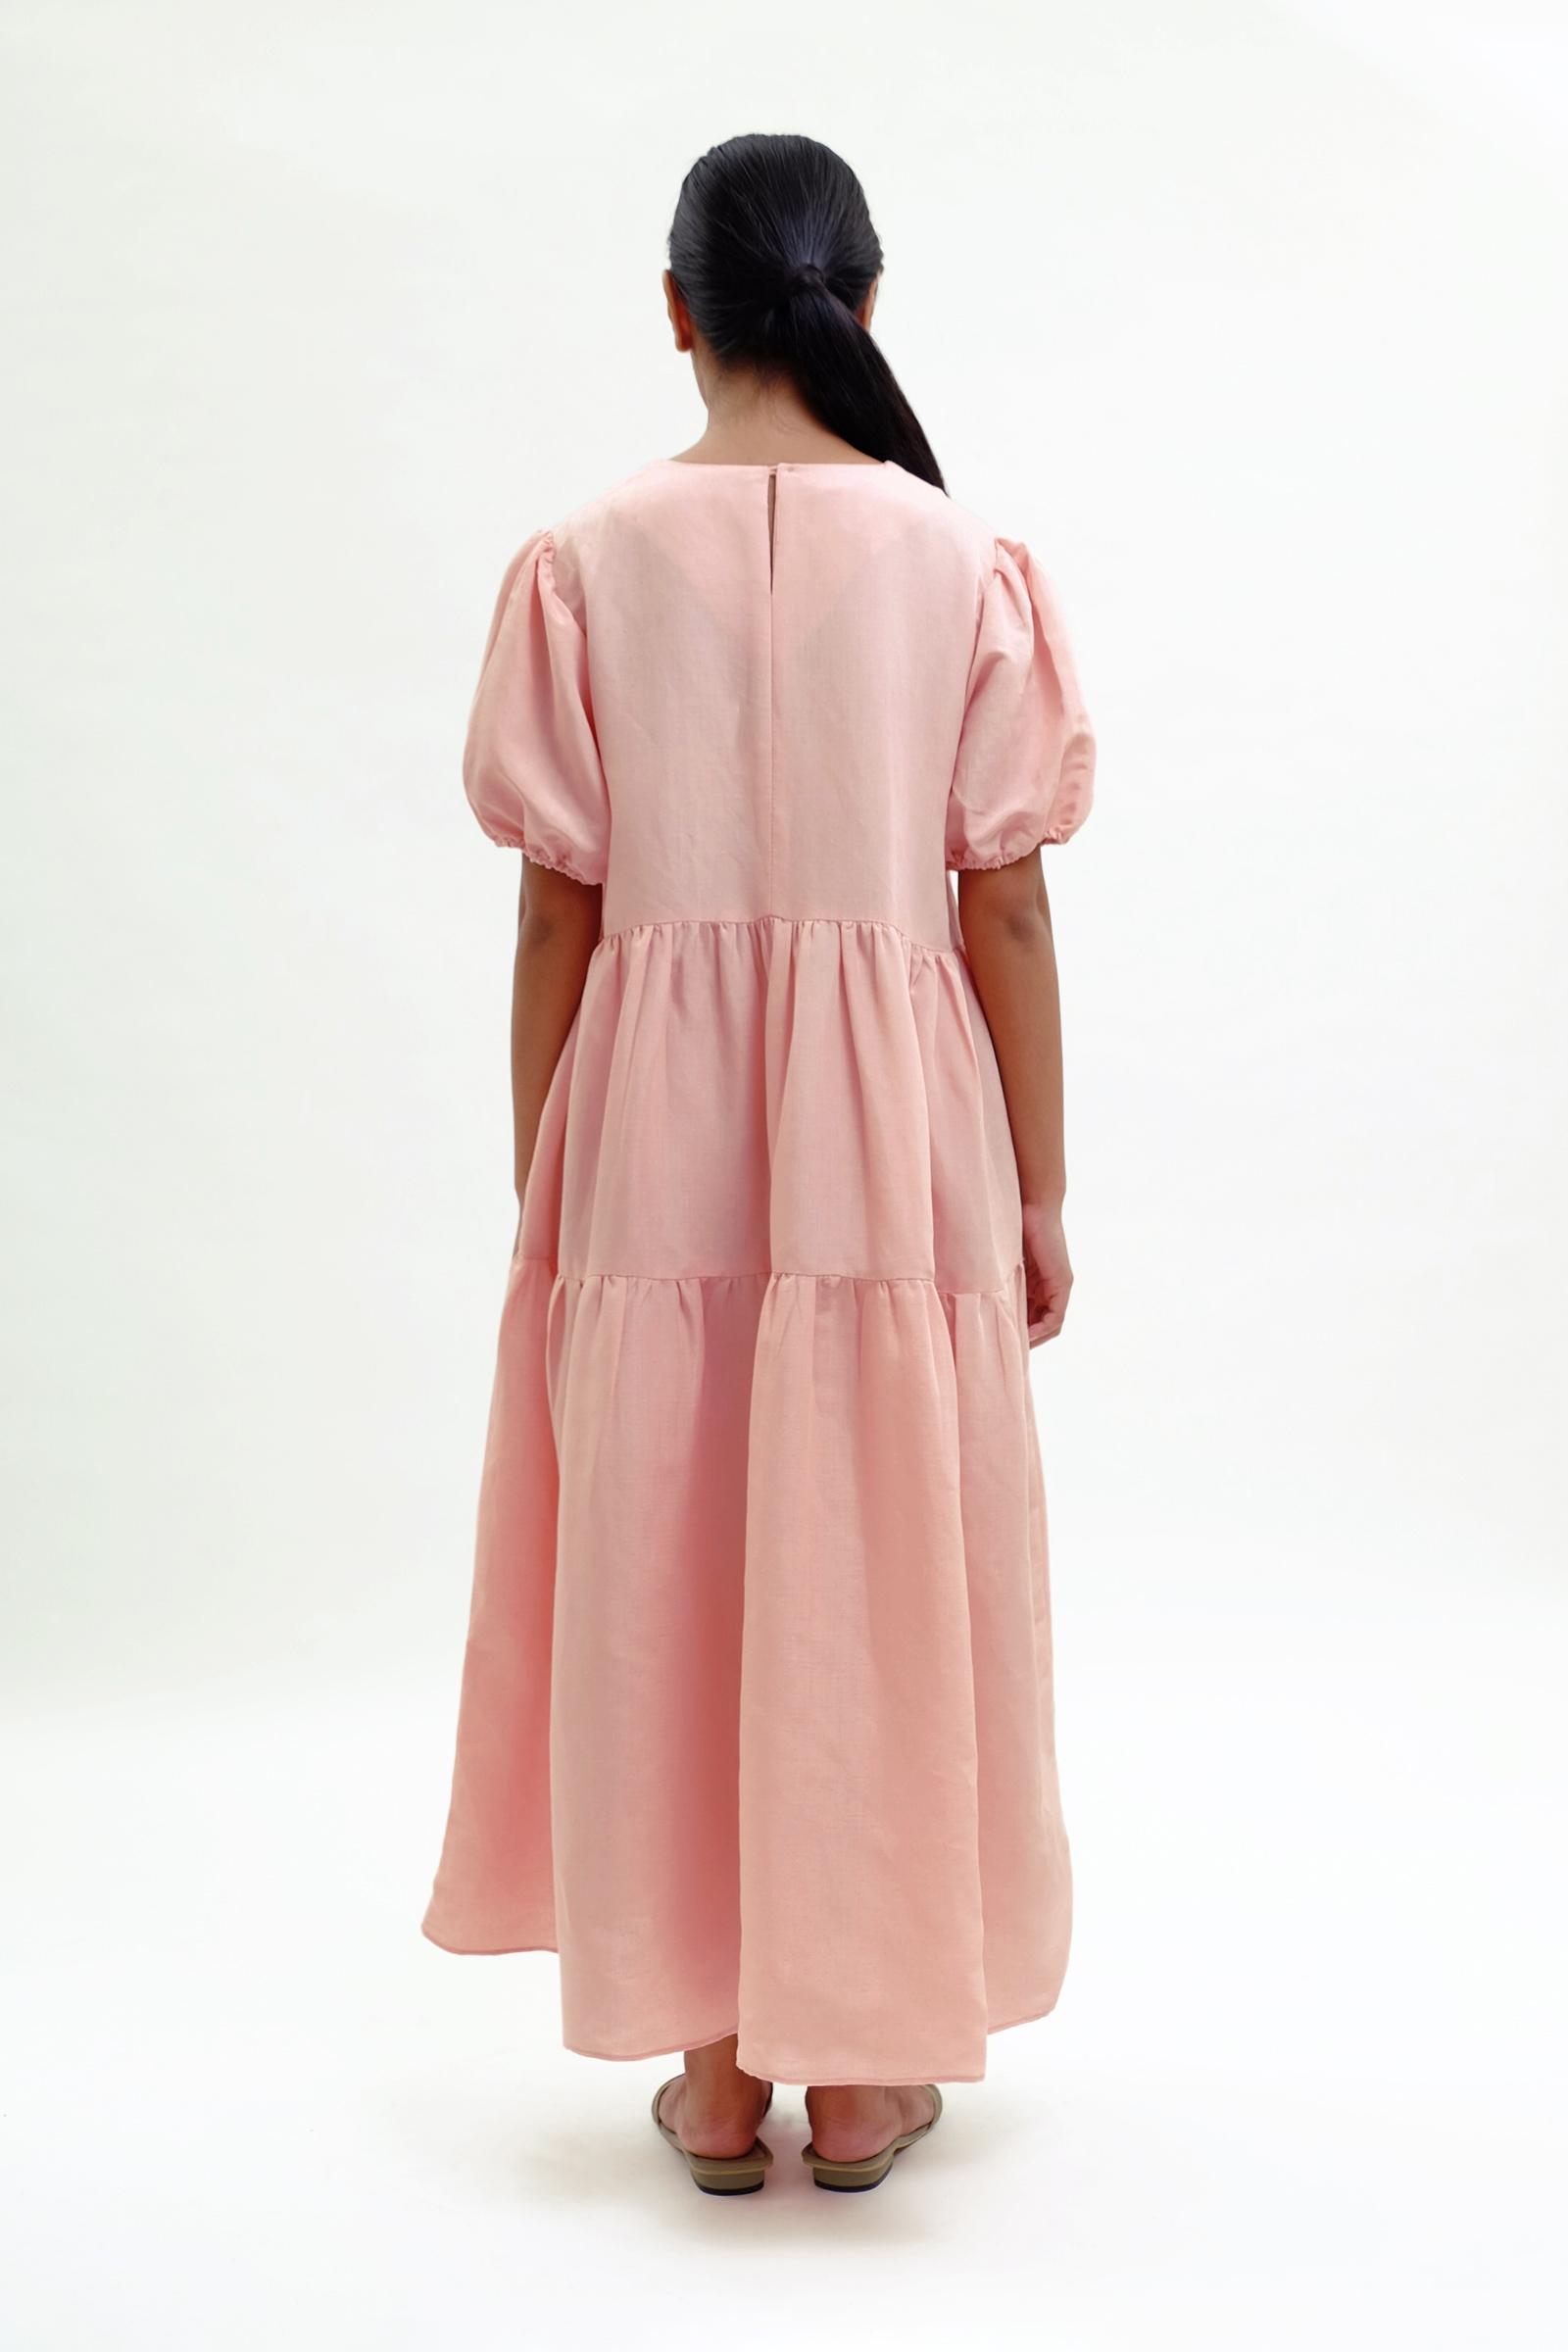 Picture of Demelza Tiered Dress  Rose Quartz